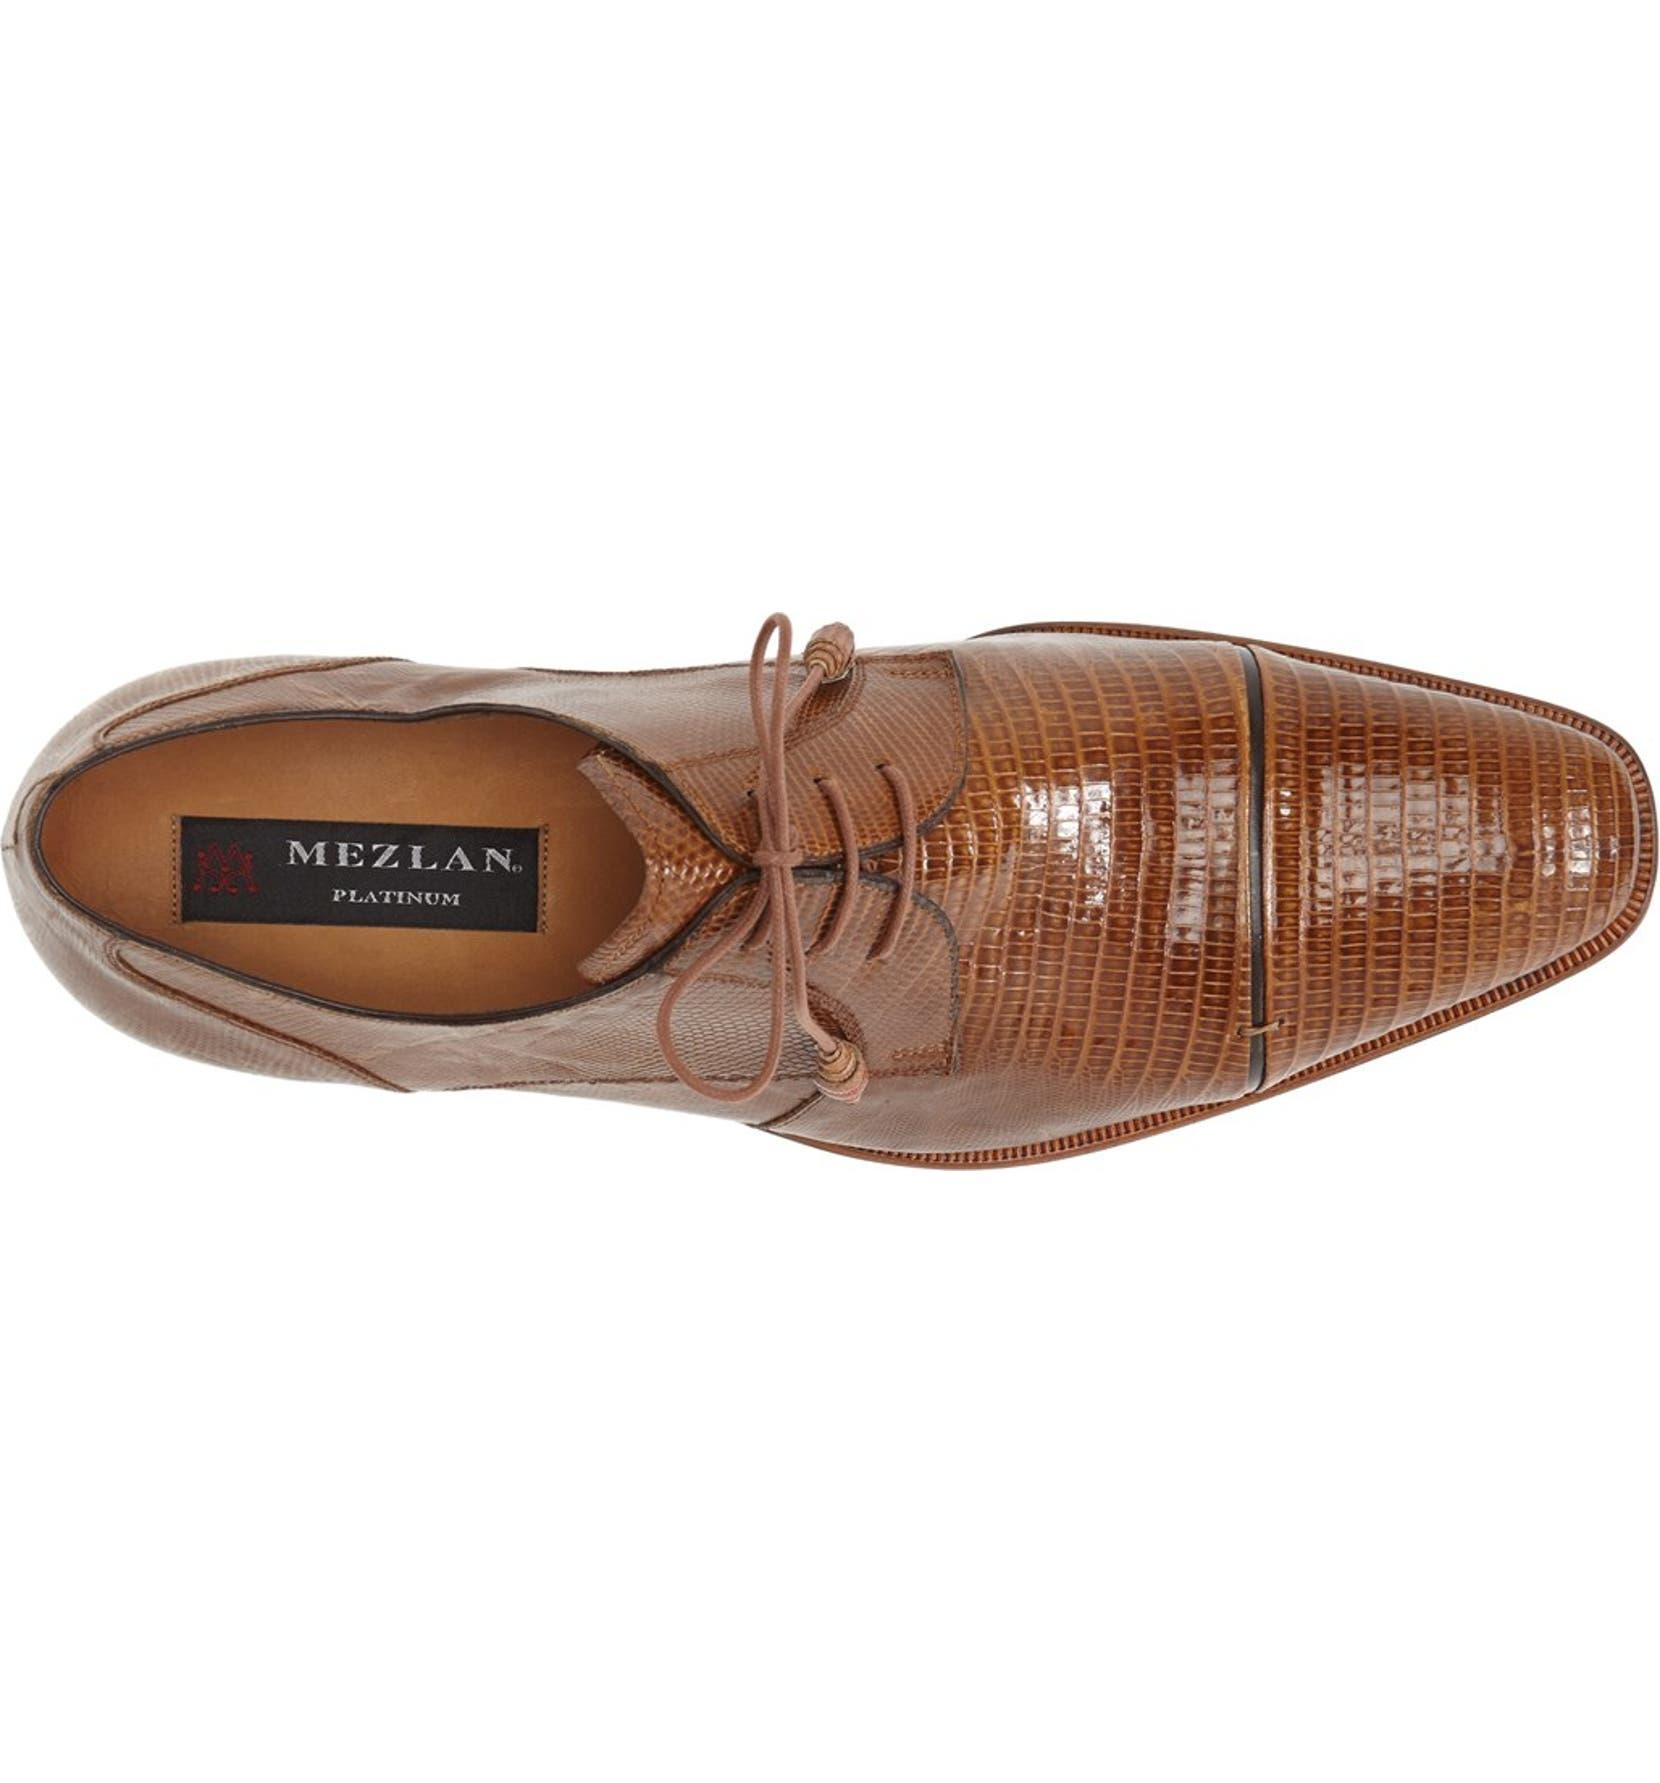 6cc95f898 Mezlan 'Valdes' Lizard Leather Cap Toe Derby (Men) | Nordstrom